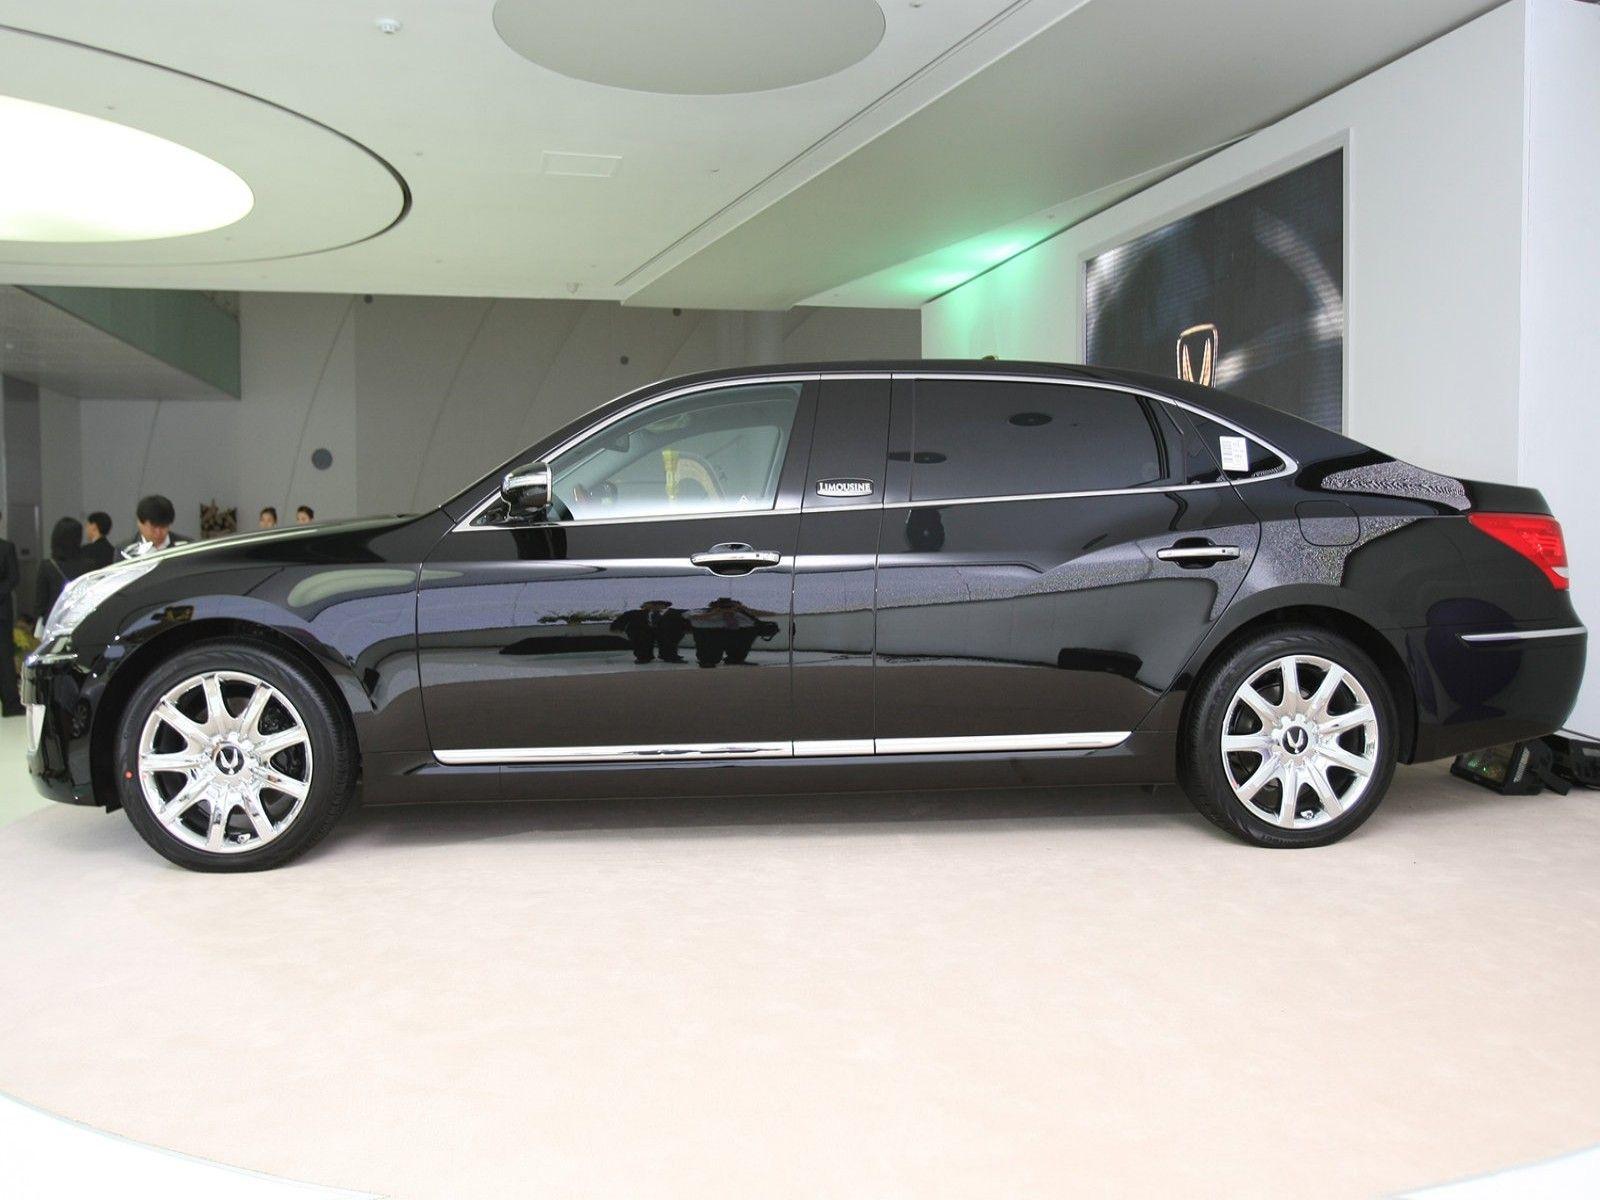 Hyundai Equus Wallpaper Hyundai Hyundai Cars Limousine